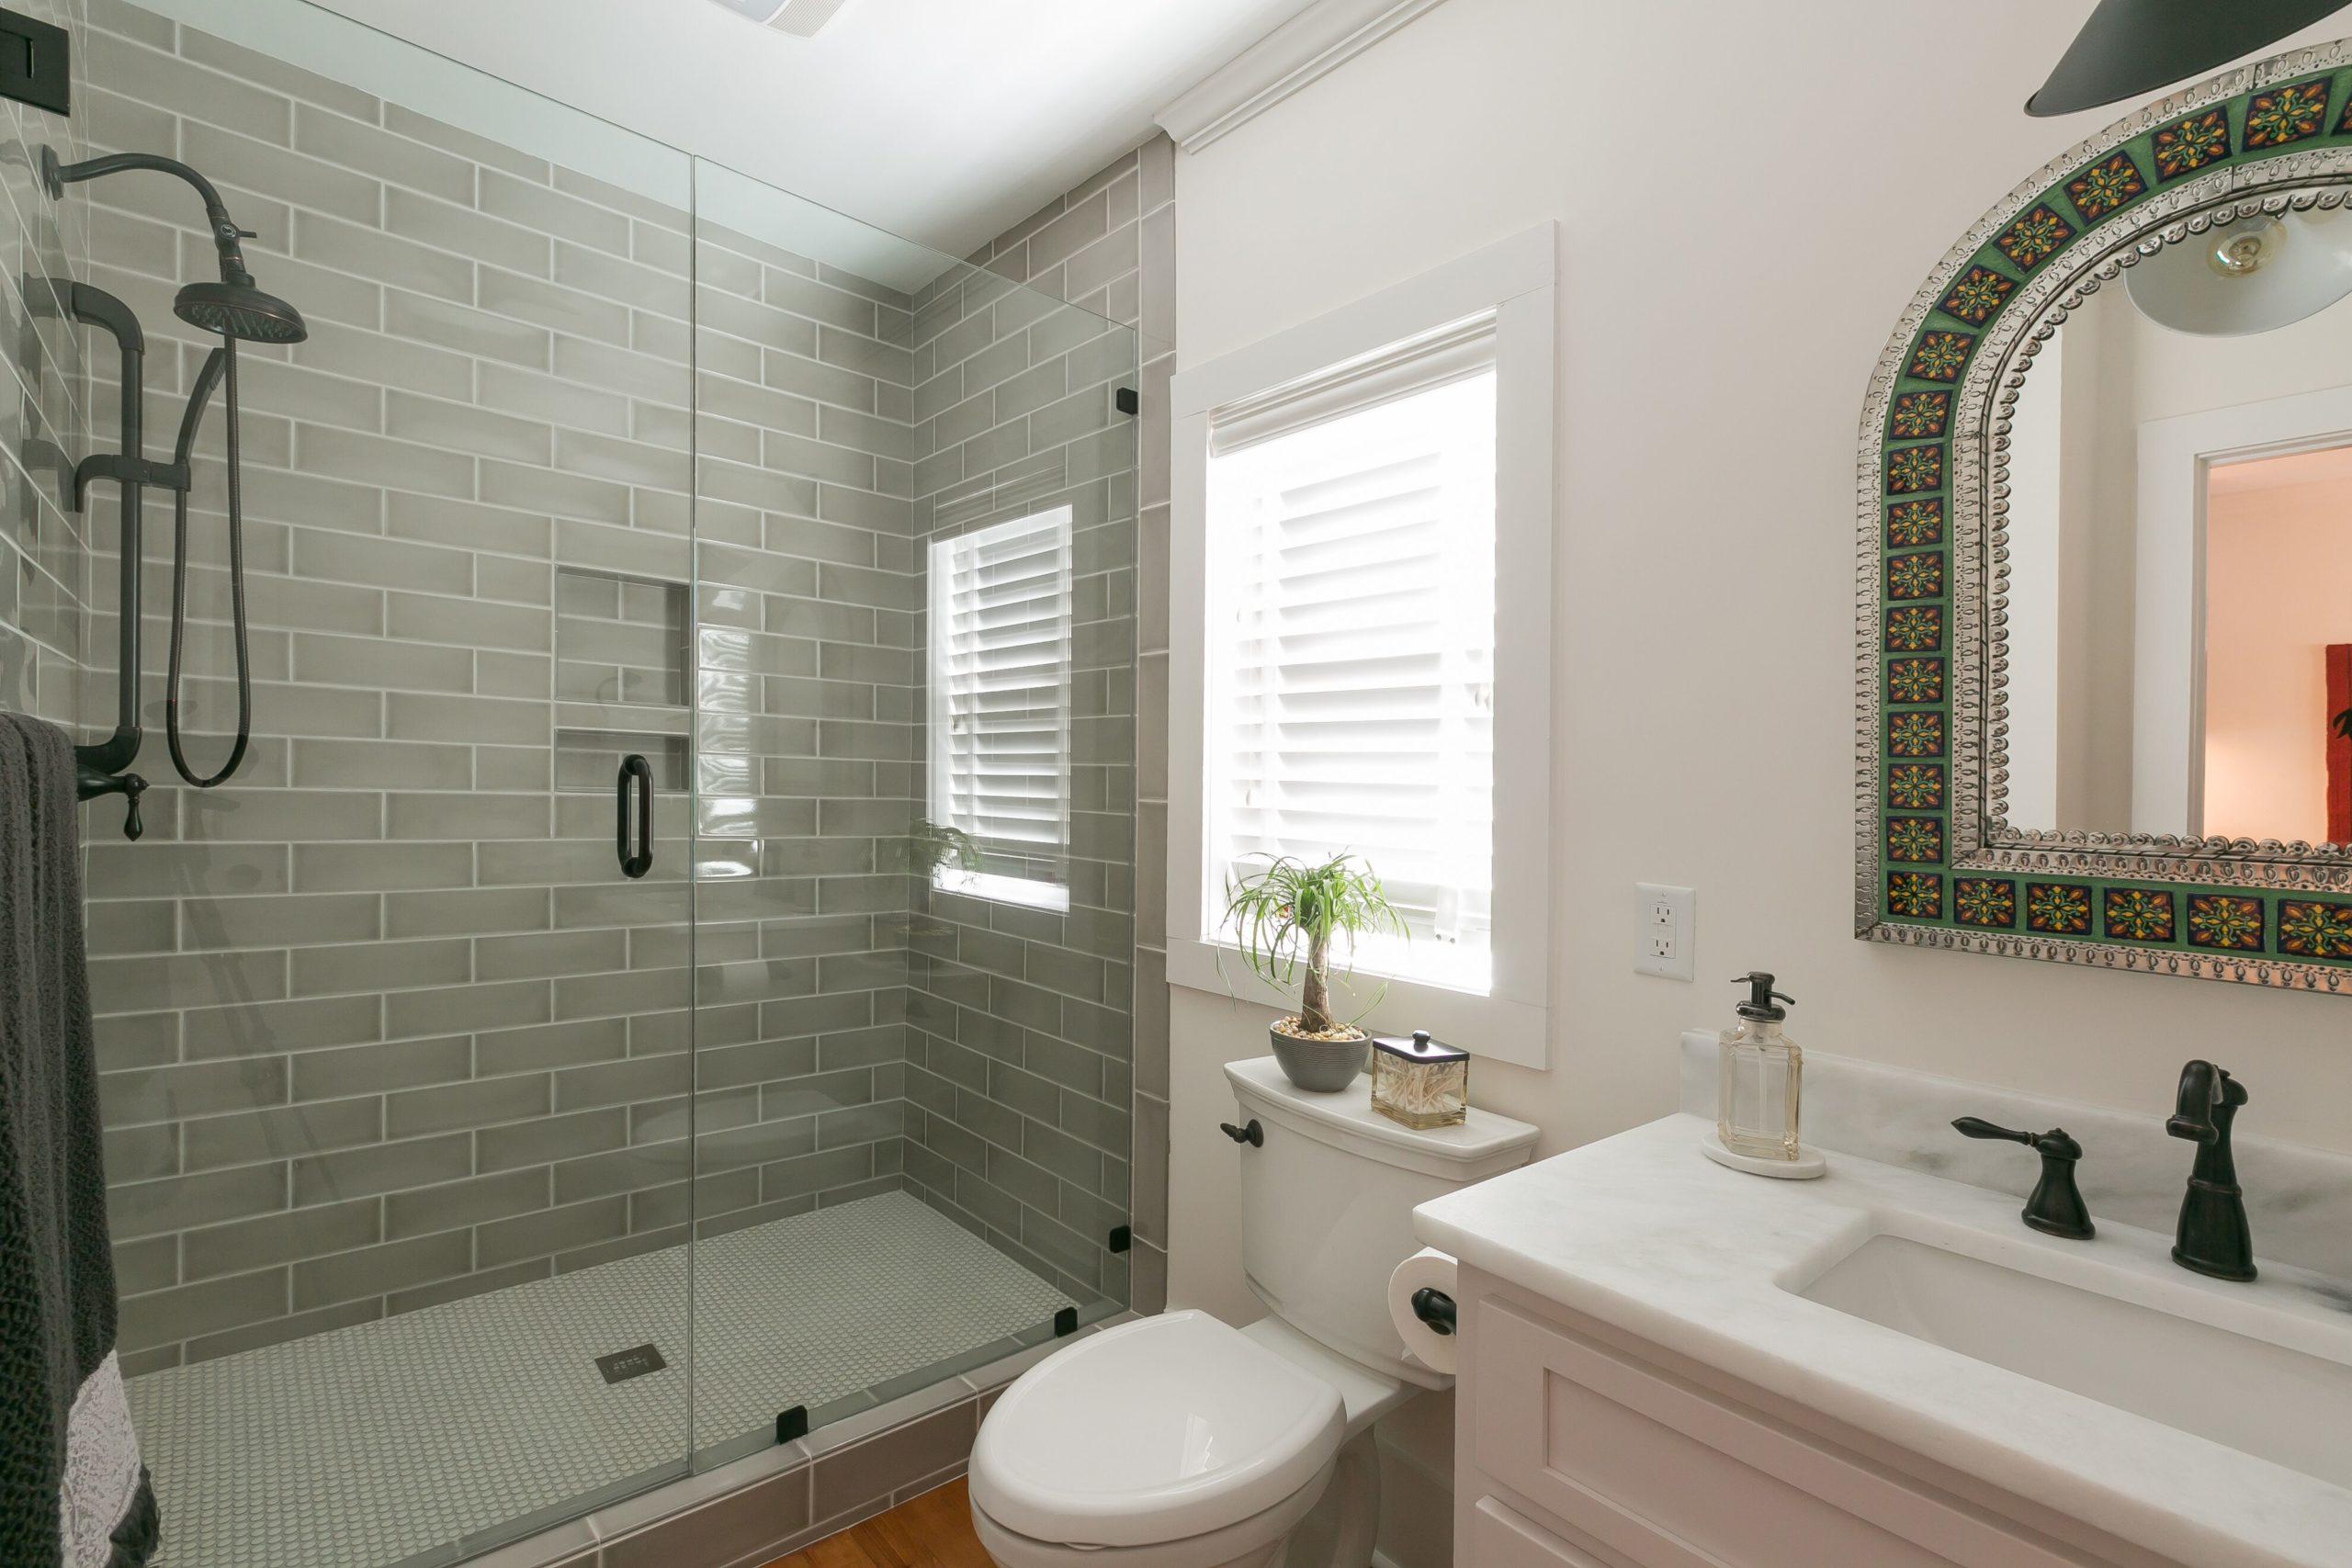 charleston-historic-home-bathroom